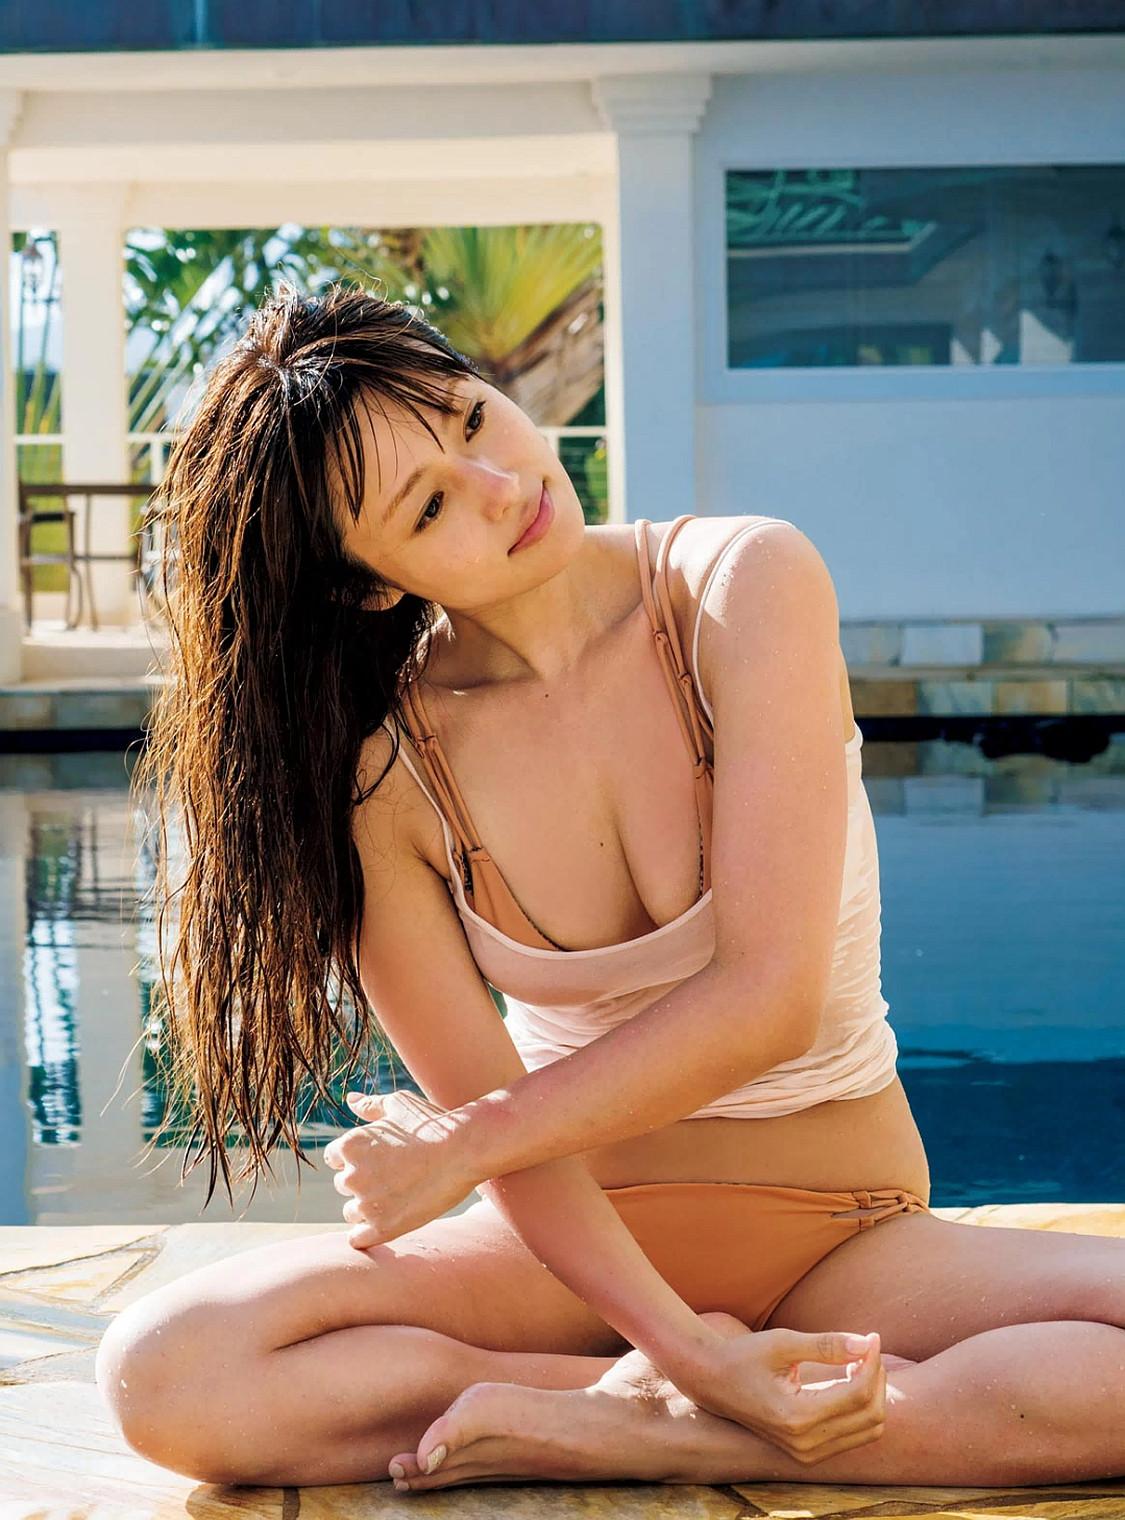 Weekly Playboy NEW YEAR 2017 8-002